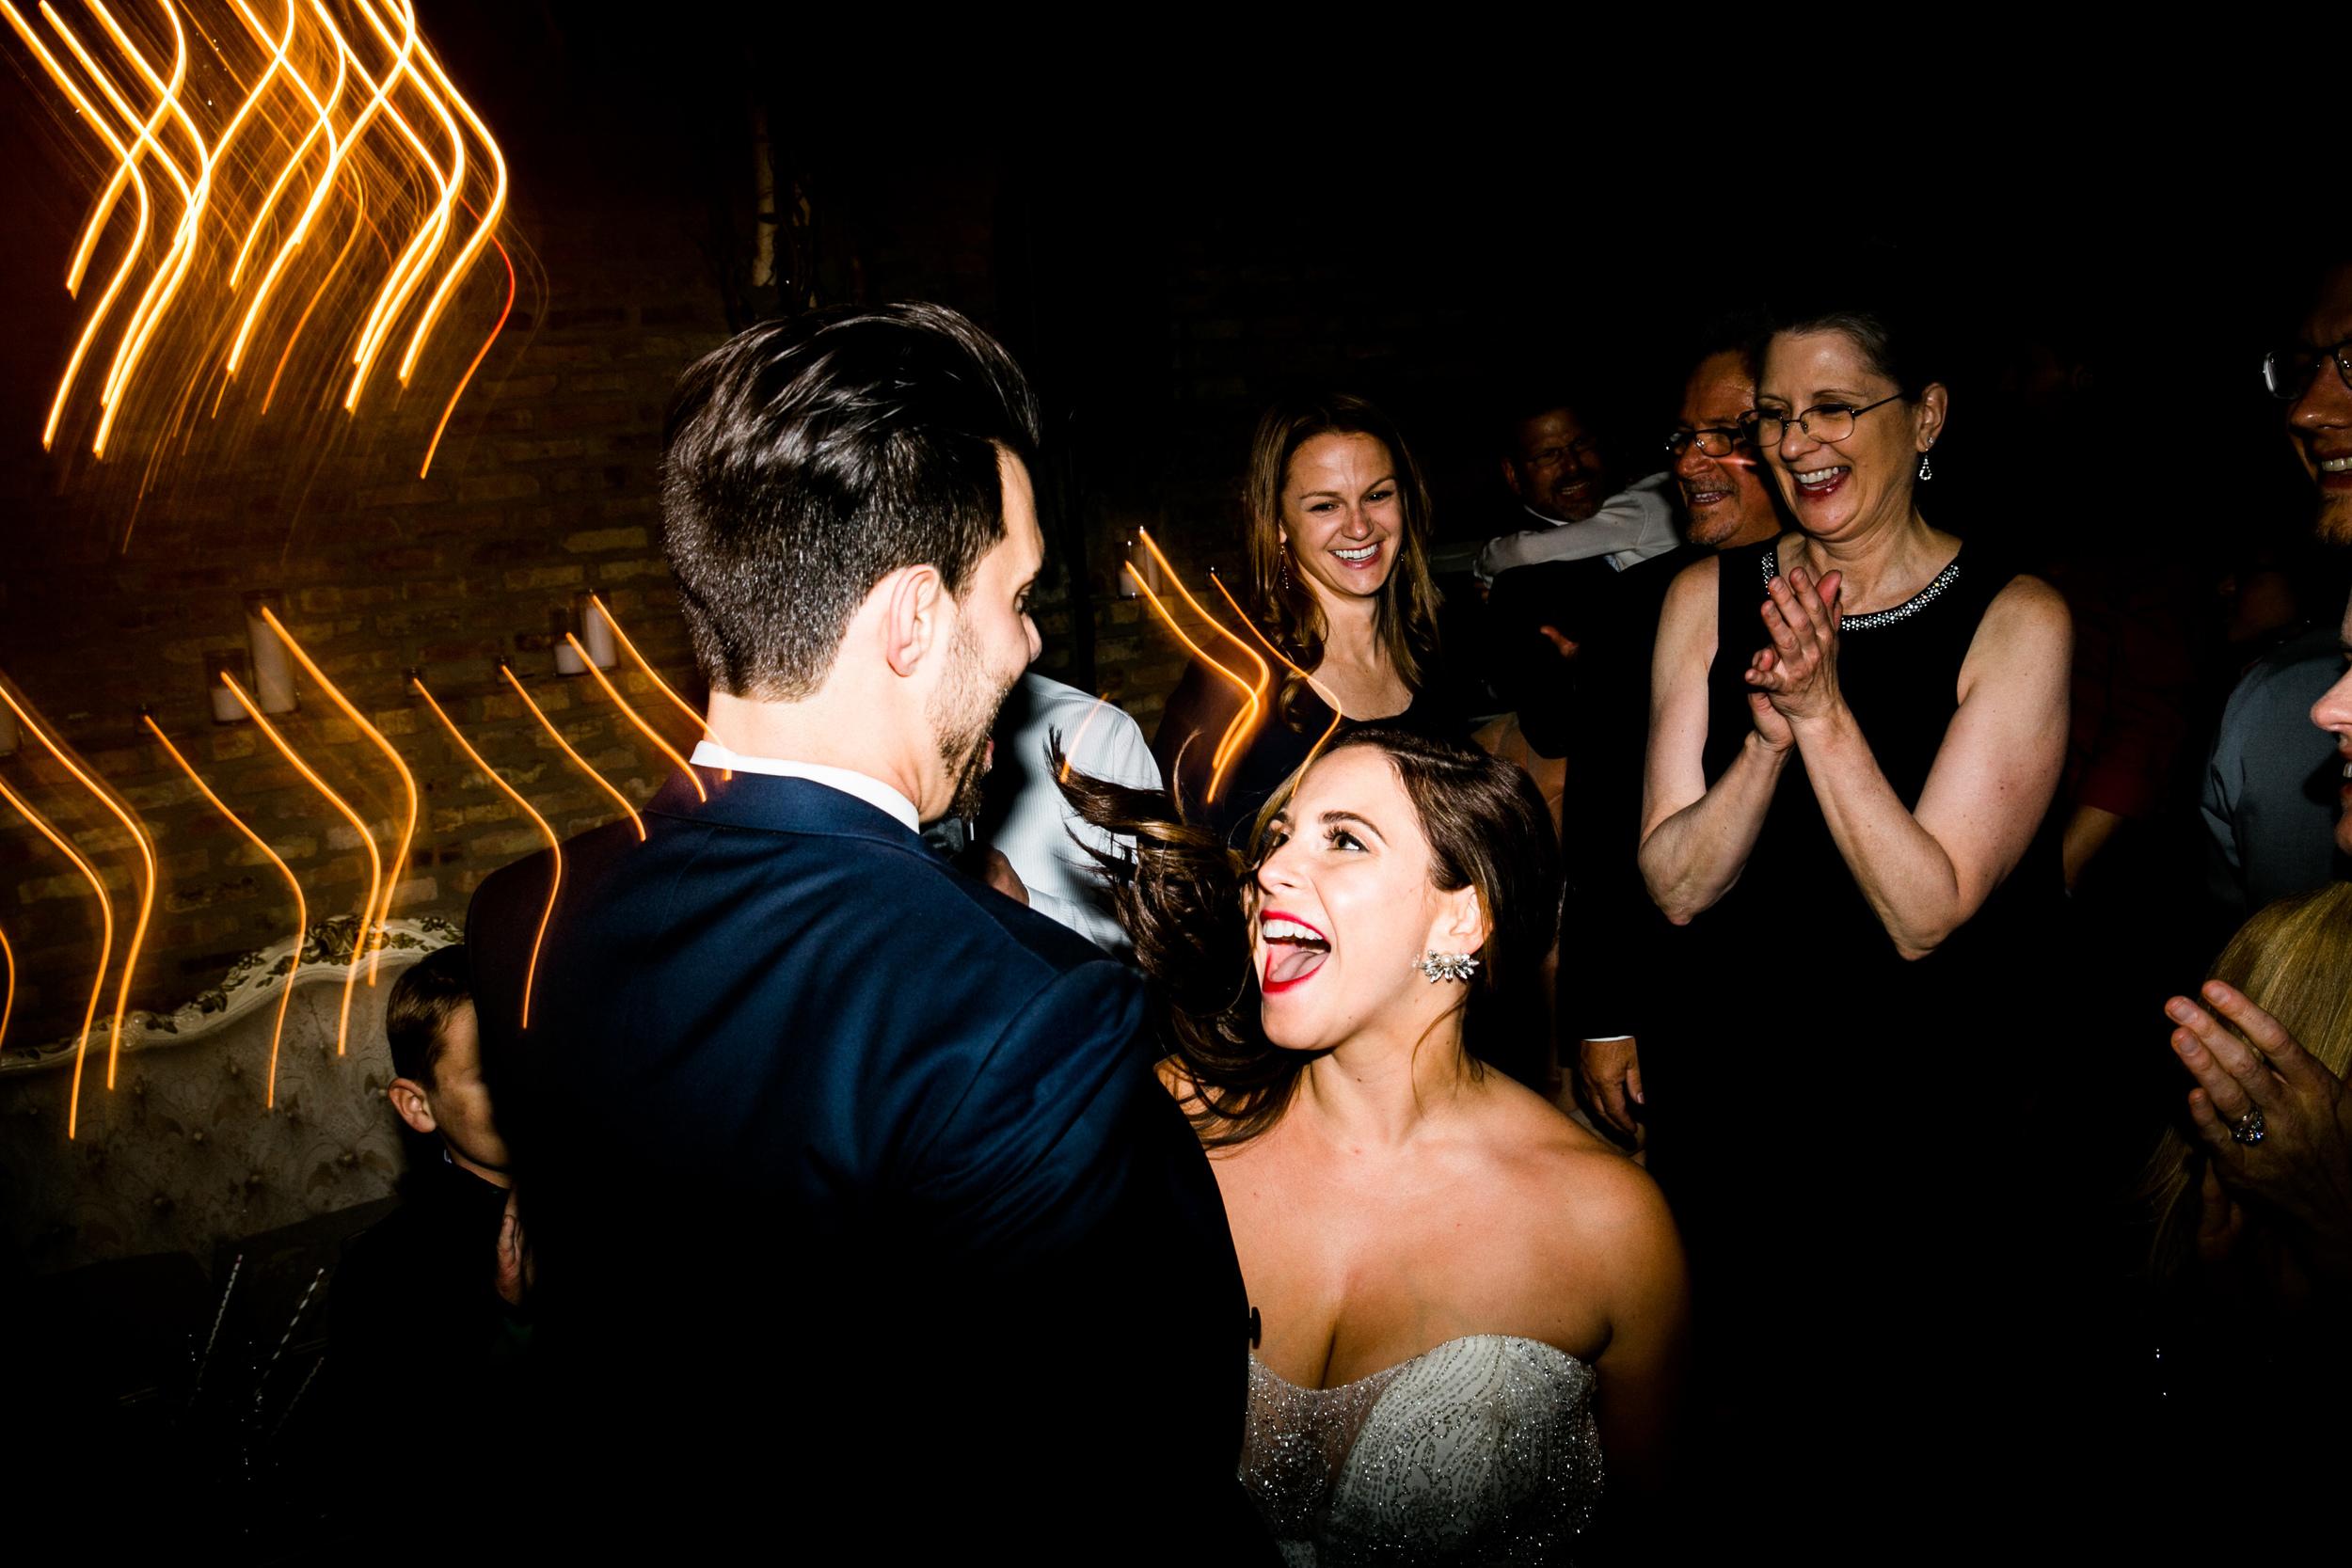 mayden_photography_weddings-152.jpg